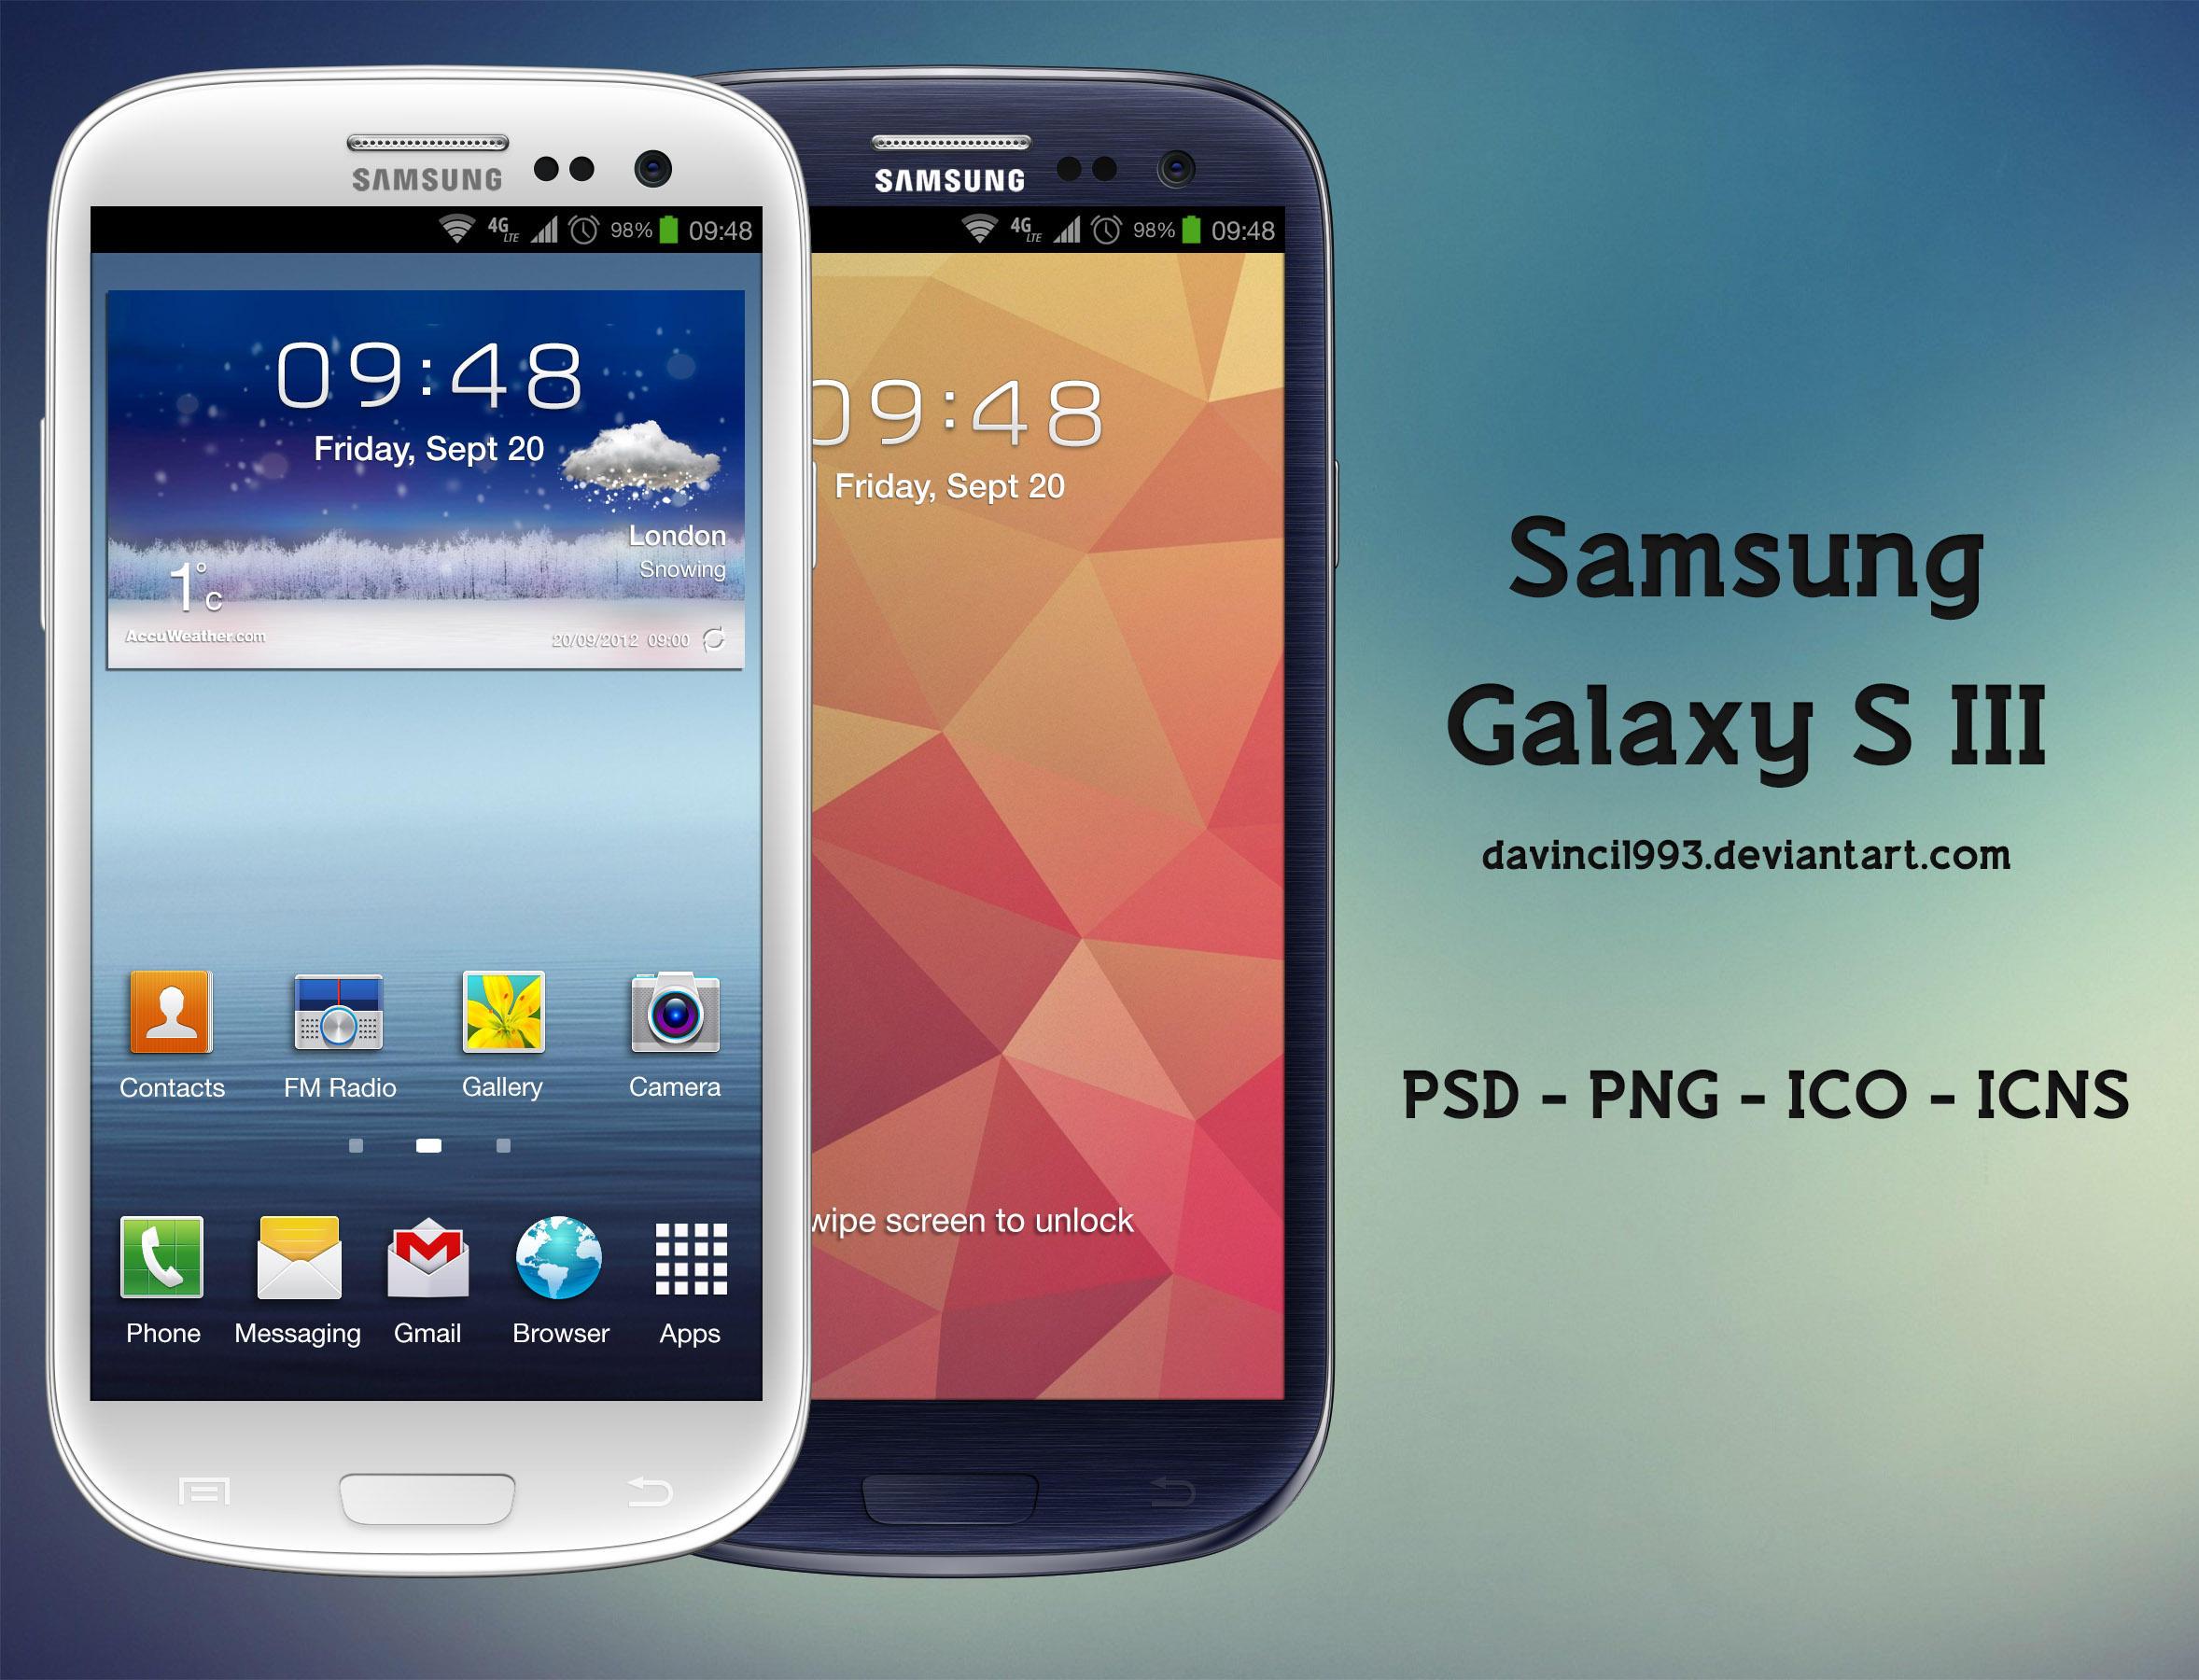 Samsung Galaxy S III: PSD | PNG | ICO | ICNS by davinci1993